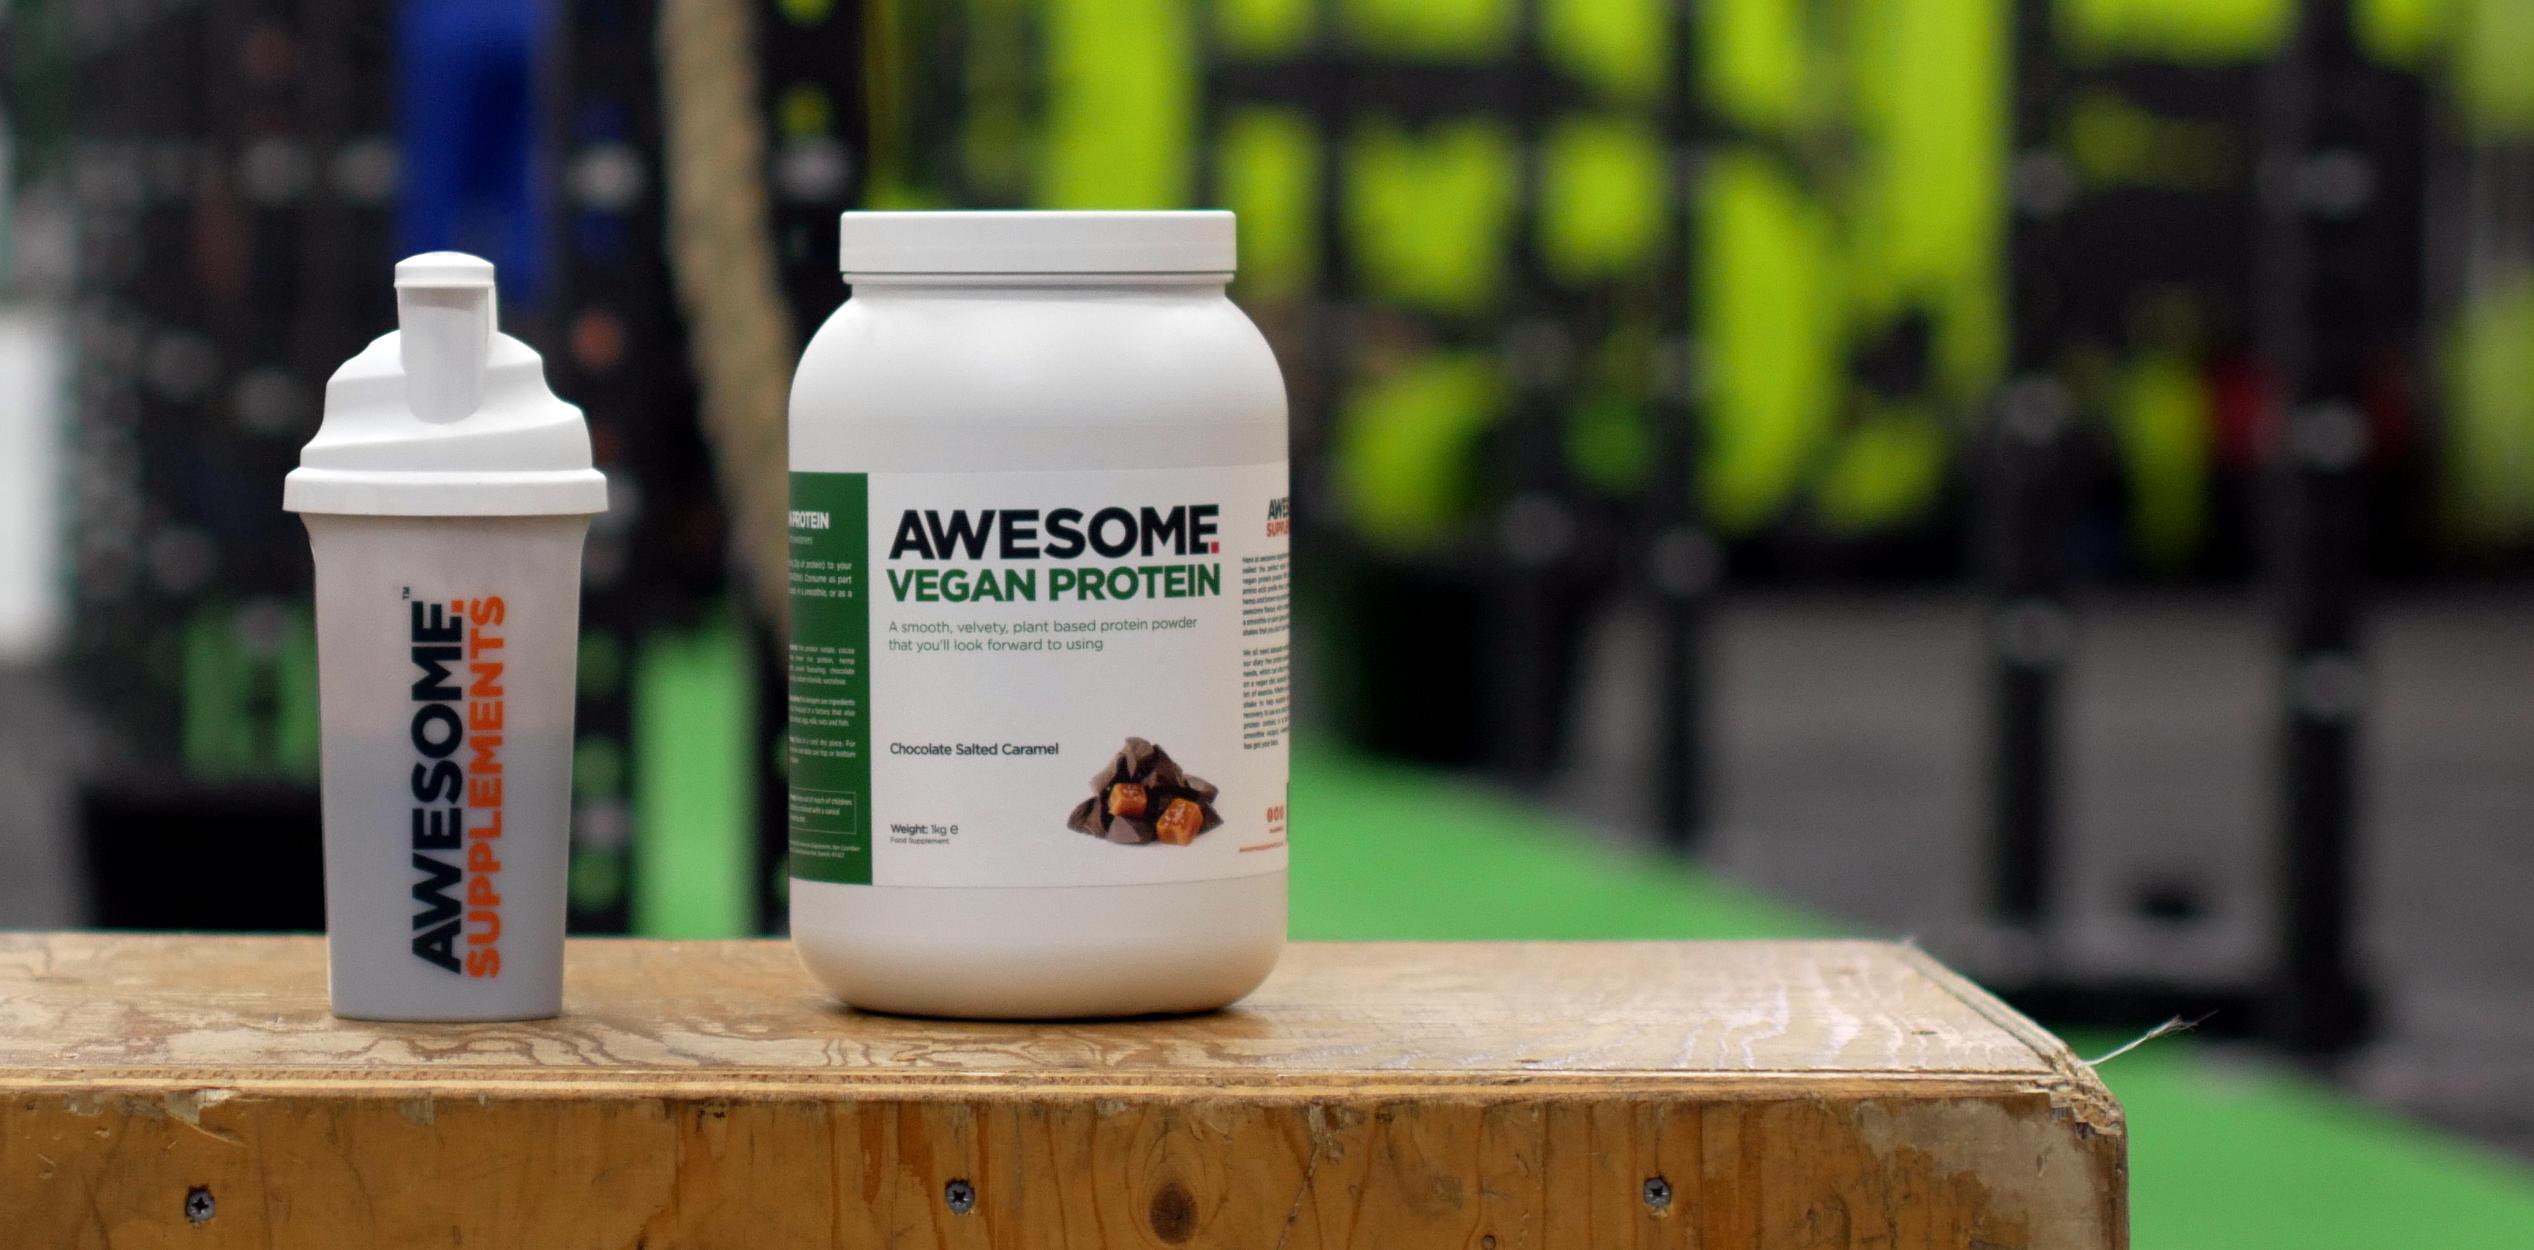 Awesome Vegan Protein - Sample hero banner